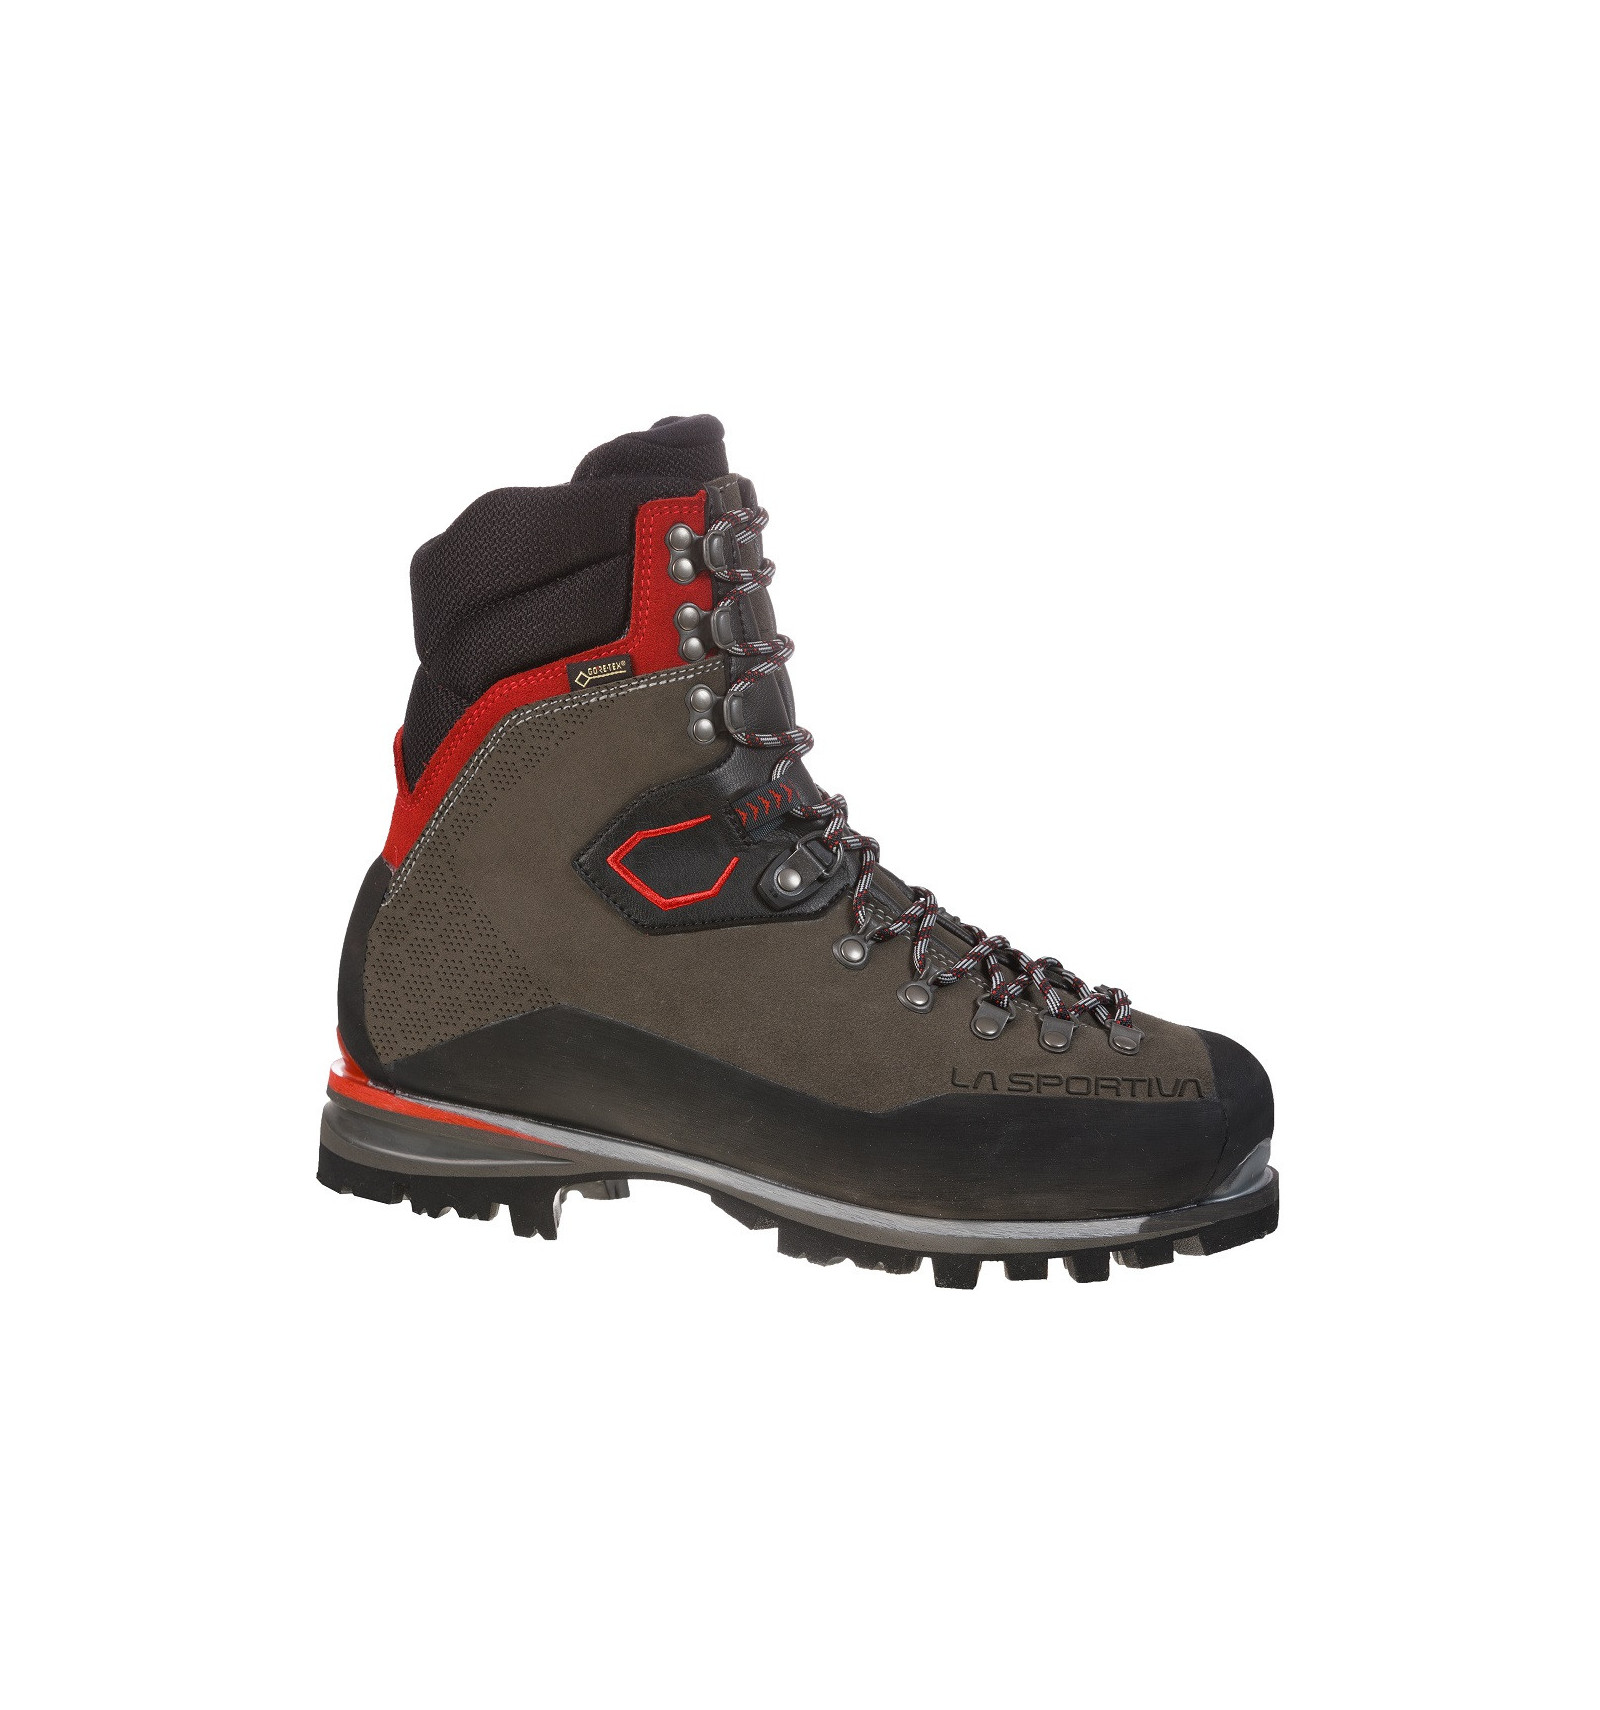 Karakorum Evo Gtx chaussure d'alpinisme cramponnable La Sportiva